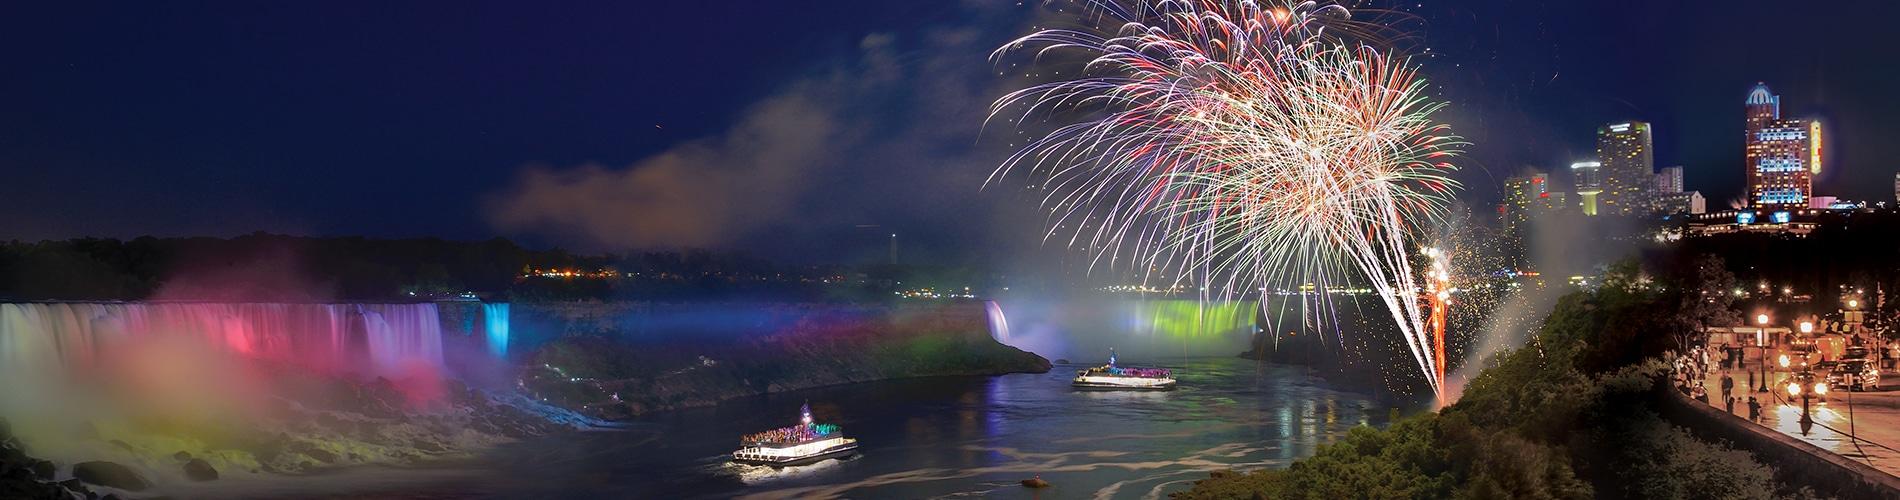 Hornblower Cruises Niagara Falls with Fireworks